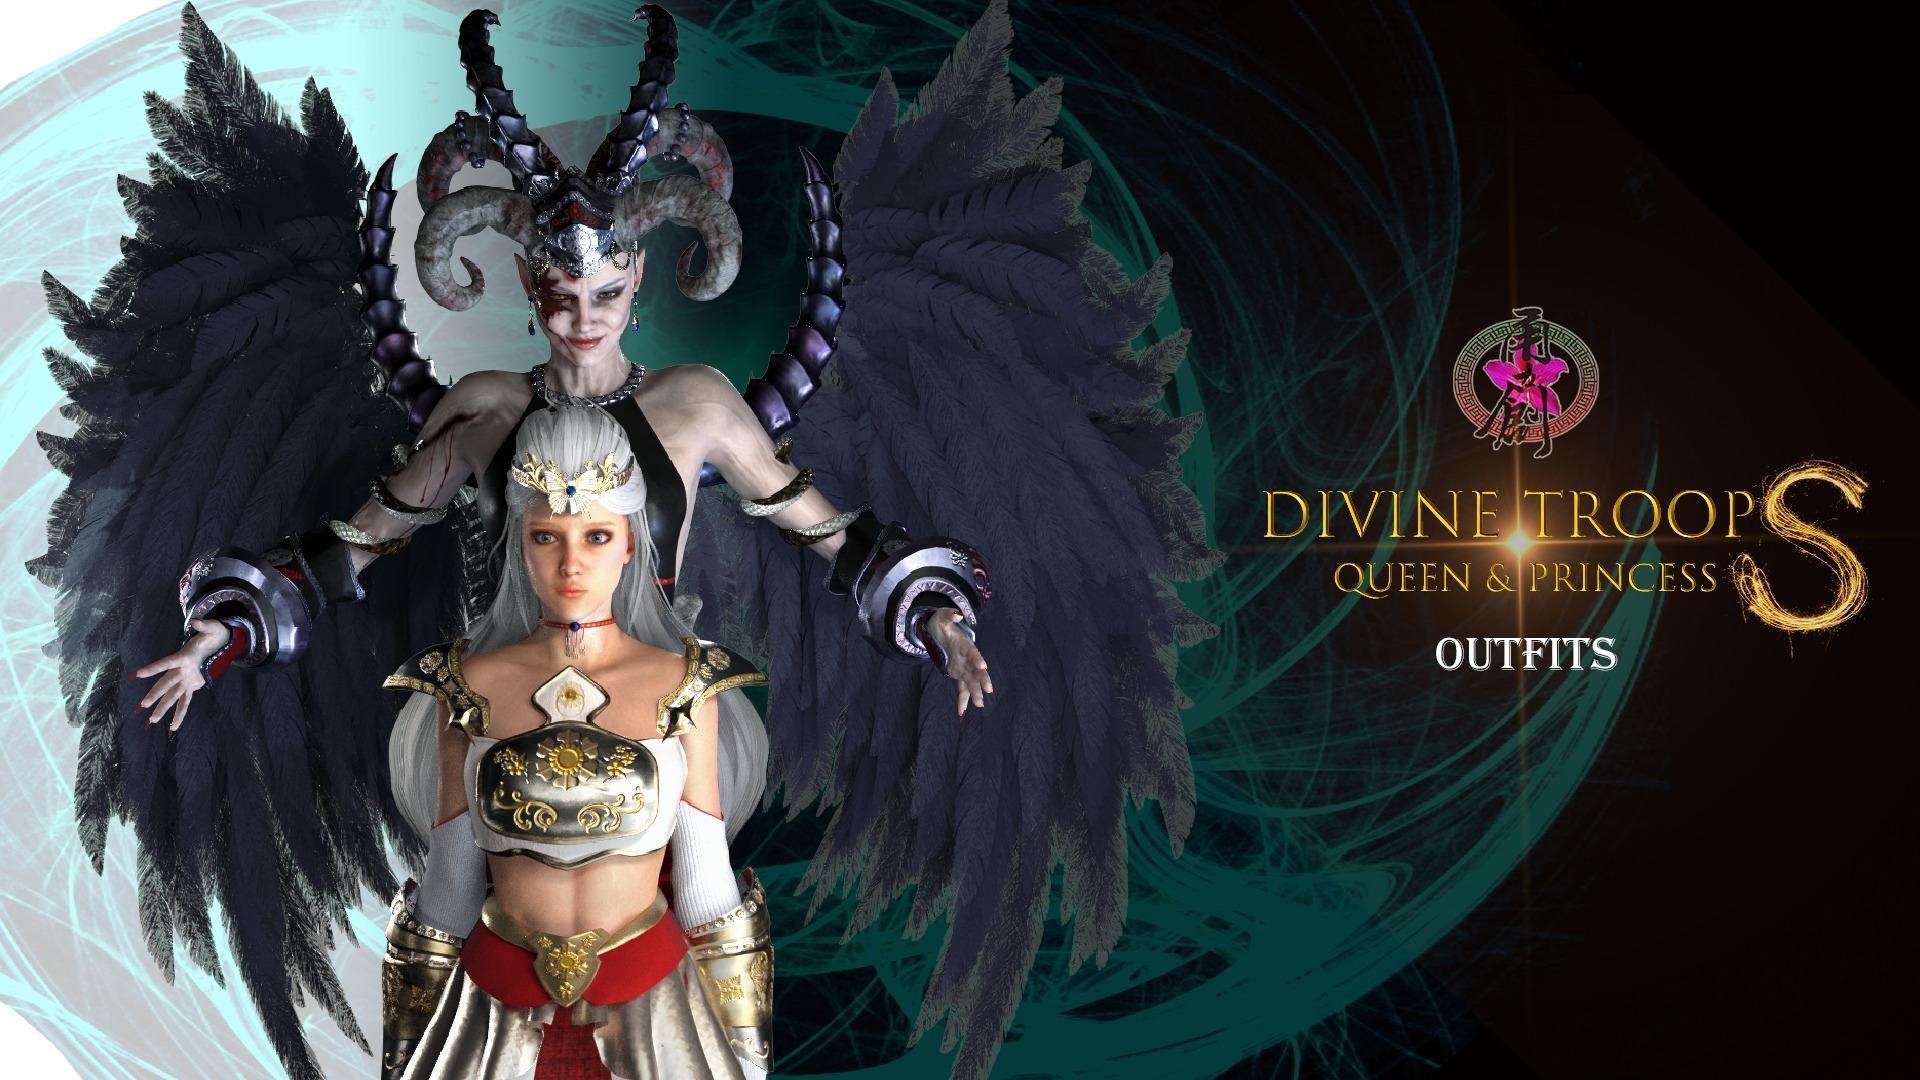 Divine Troop Super - Queen & Princess Outfits